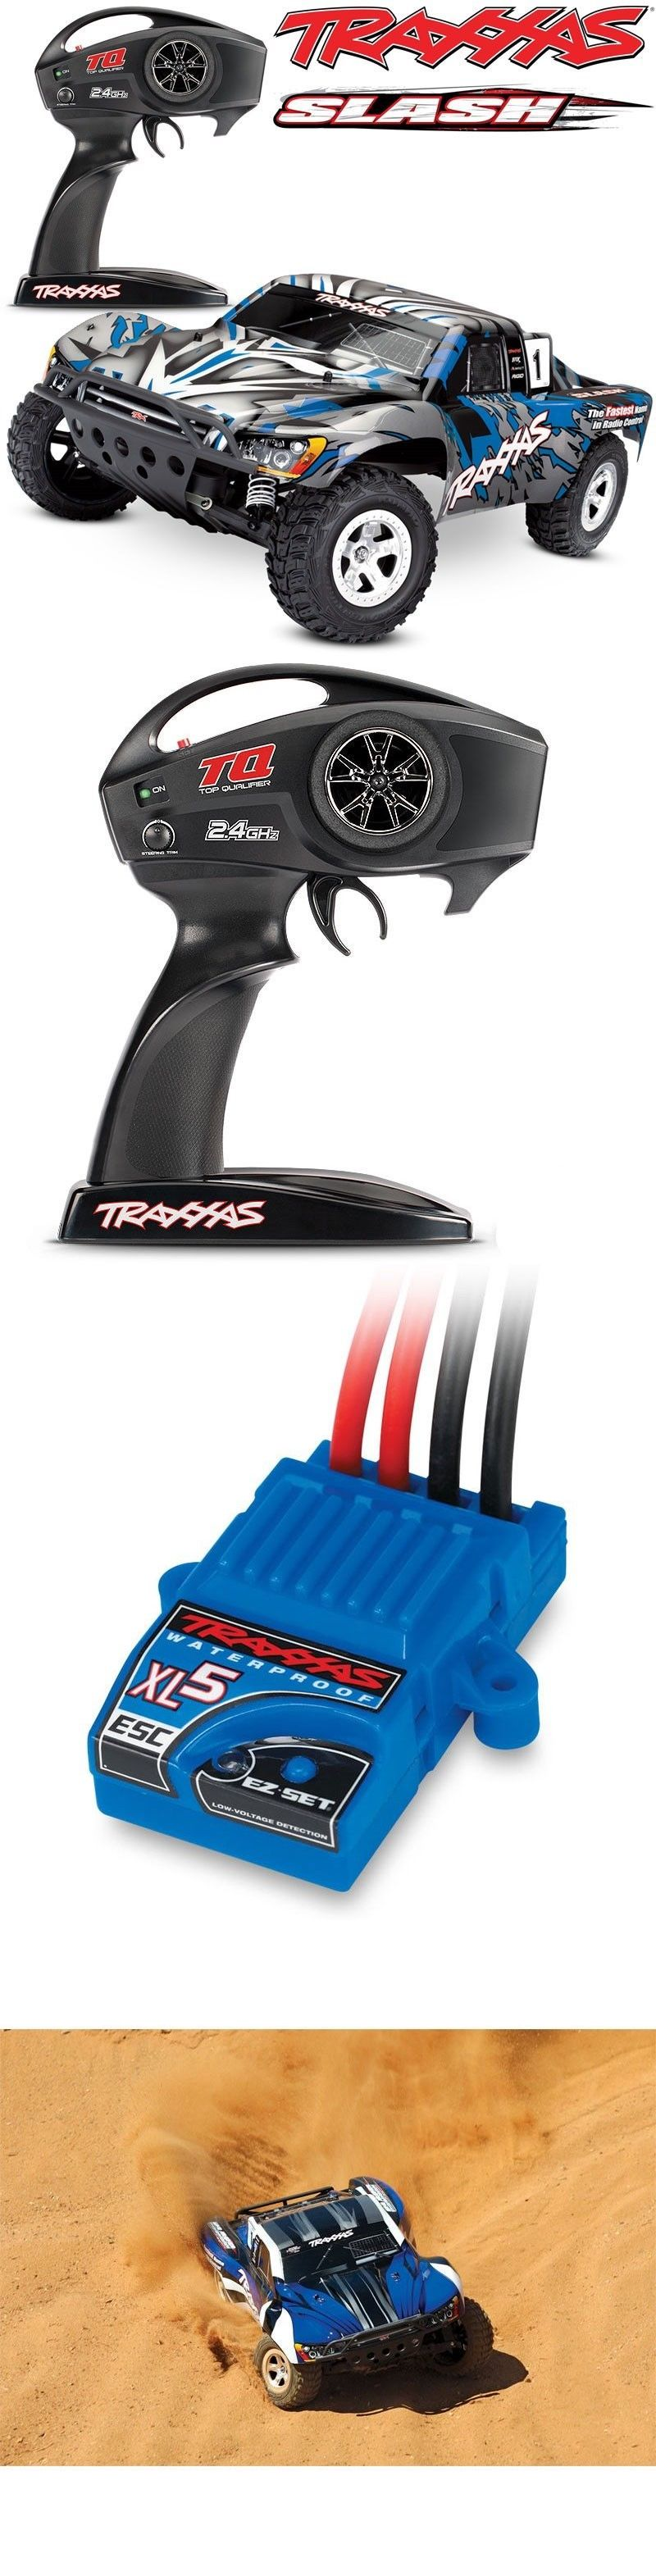 Details about NEW Traxxas 58024 Slash XL5 2WD BLUE w/TQ 2